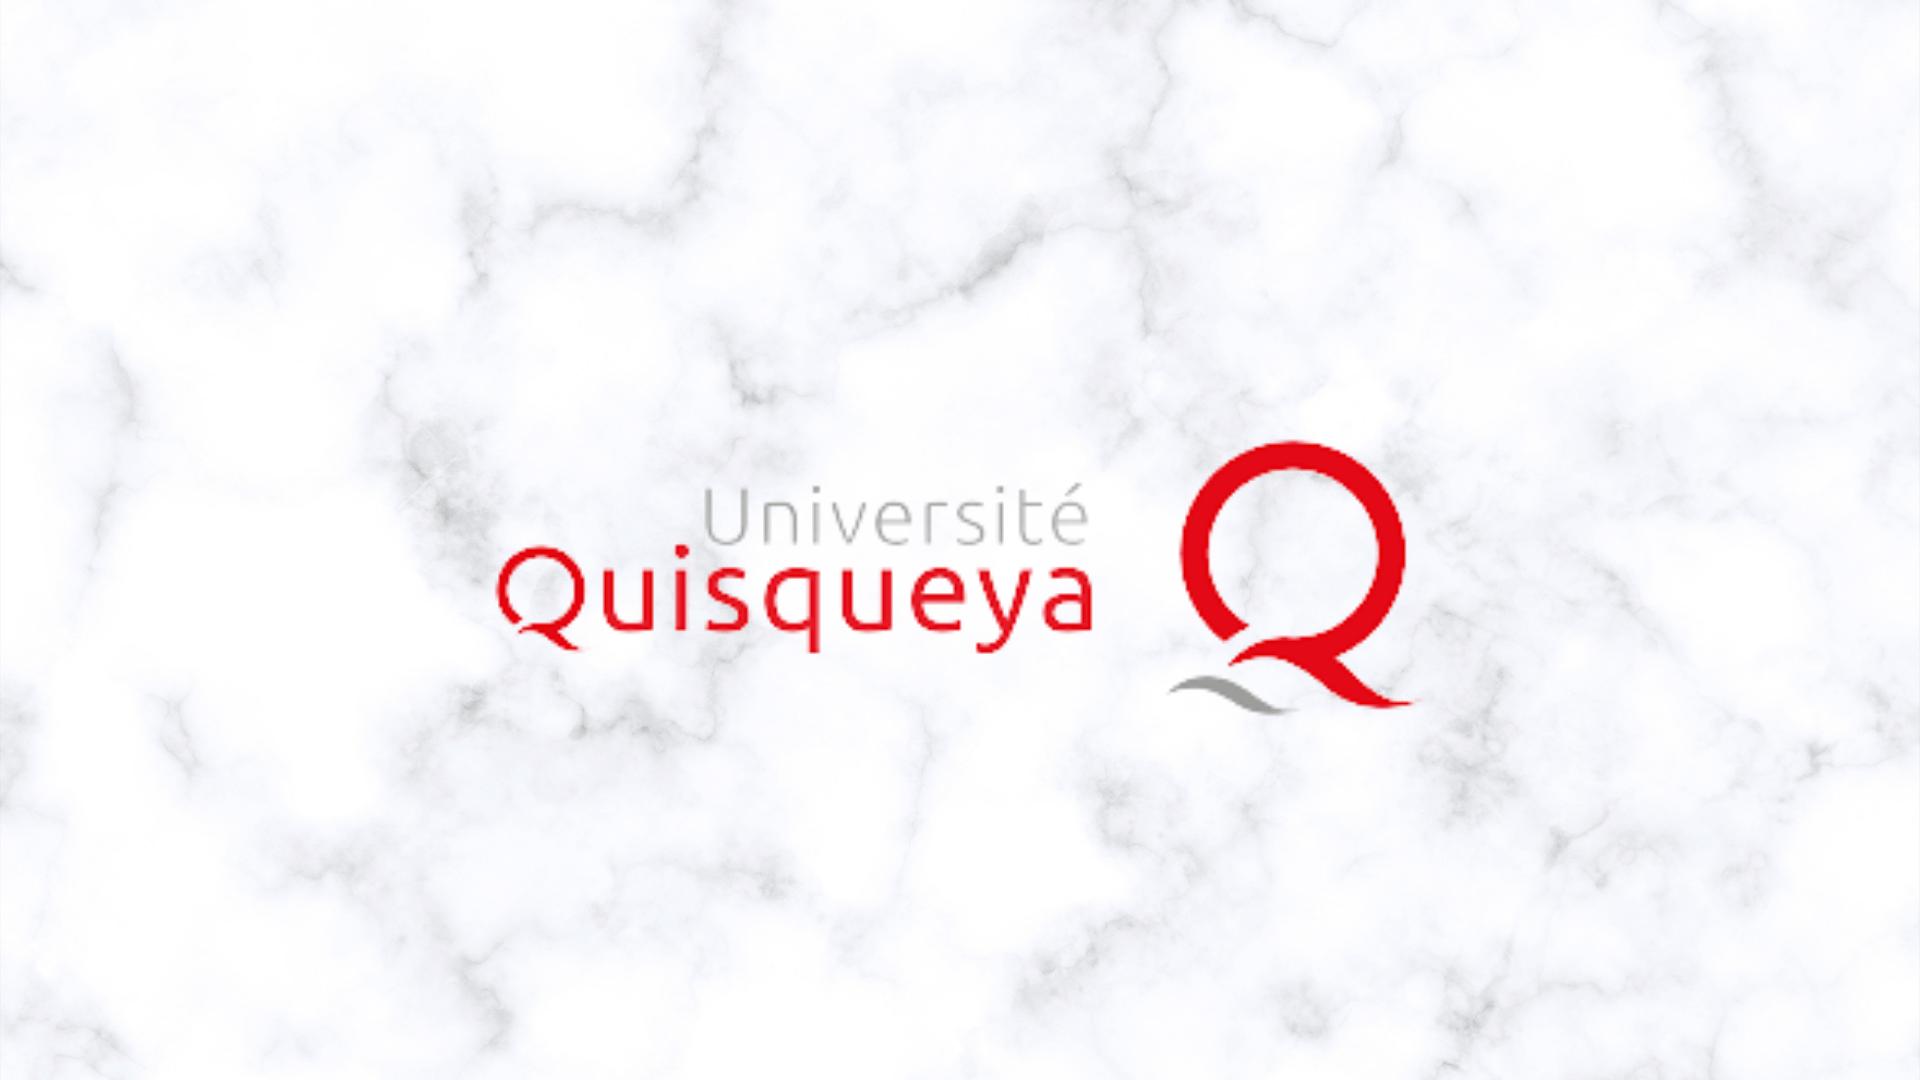 7 février 2021, fin de mandat de Jovenel moïse, l'université Quisqueya apporte ses explications